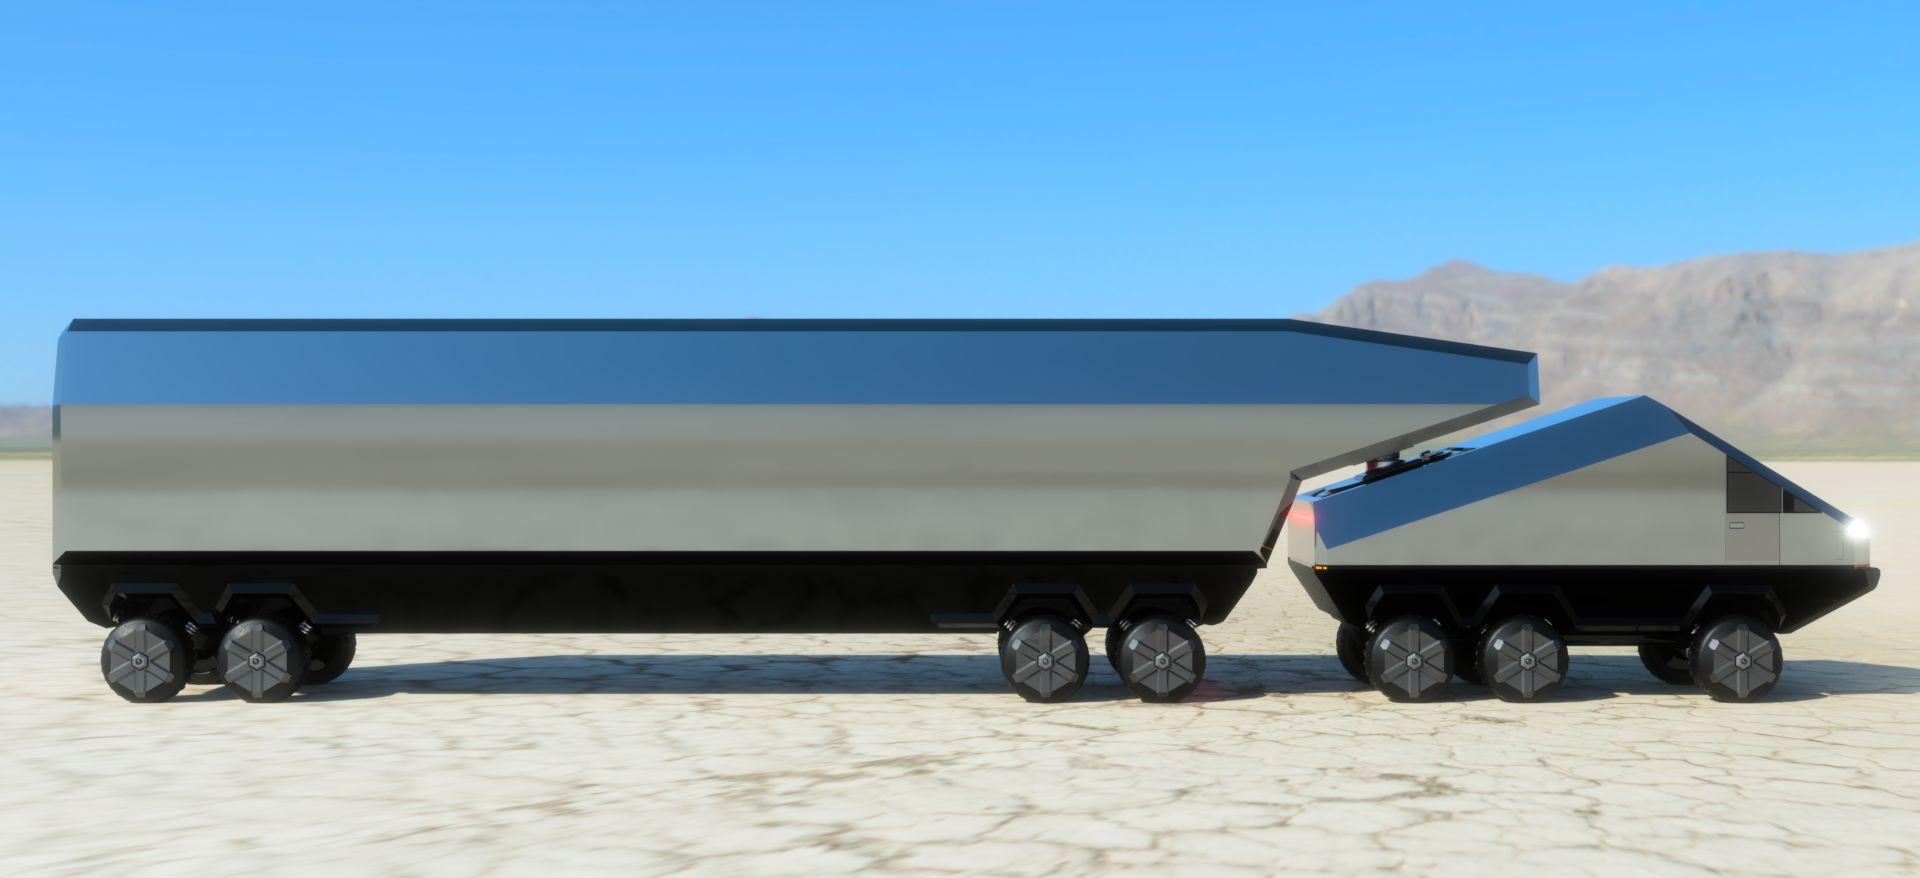 Tesla-cybervan-2020-apr-14-10-02-36am-000-customizedview18928537725-png-3500-3500